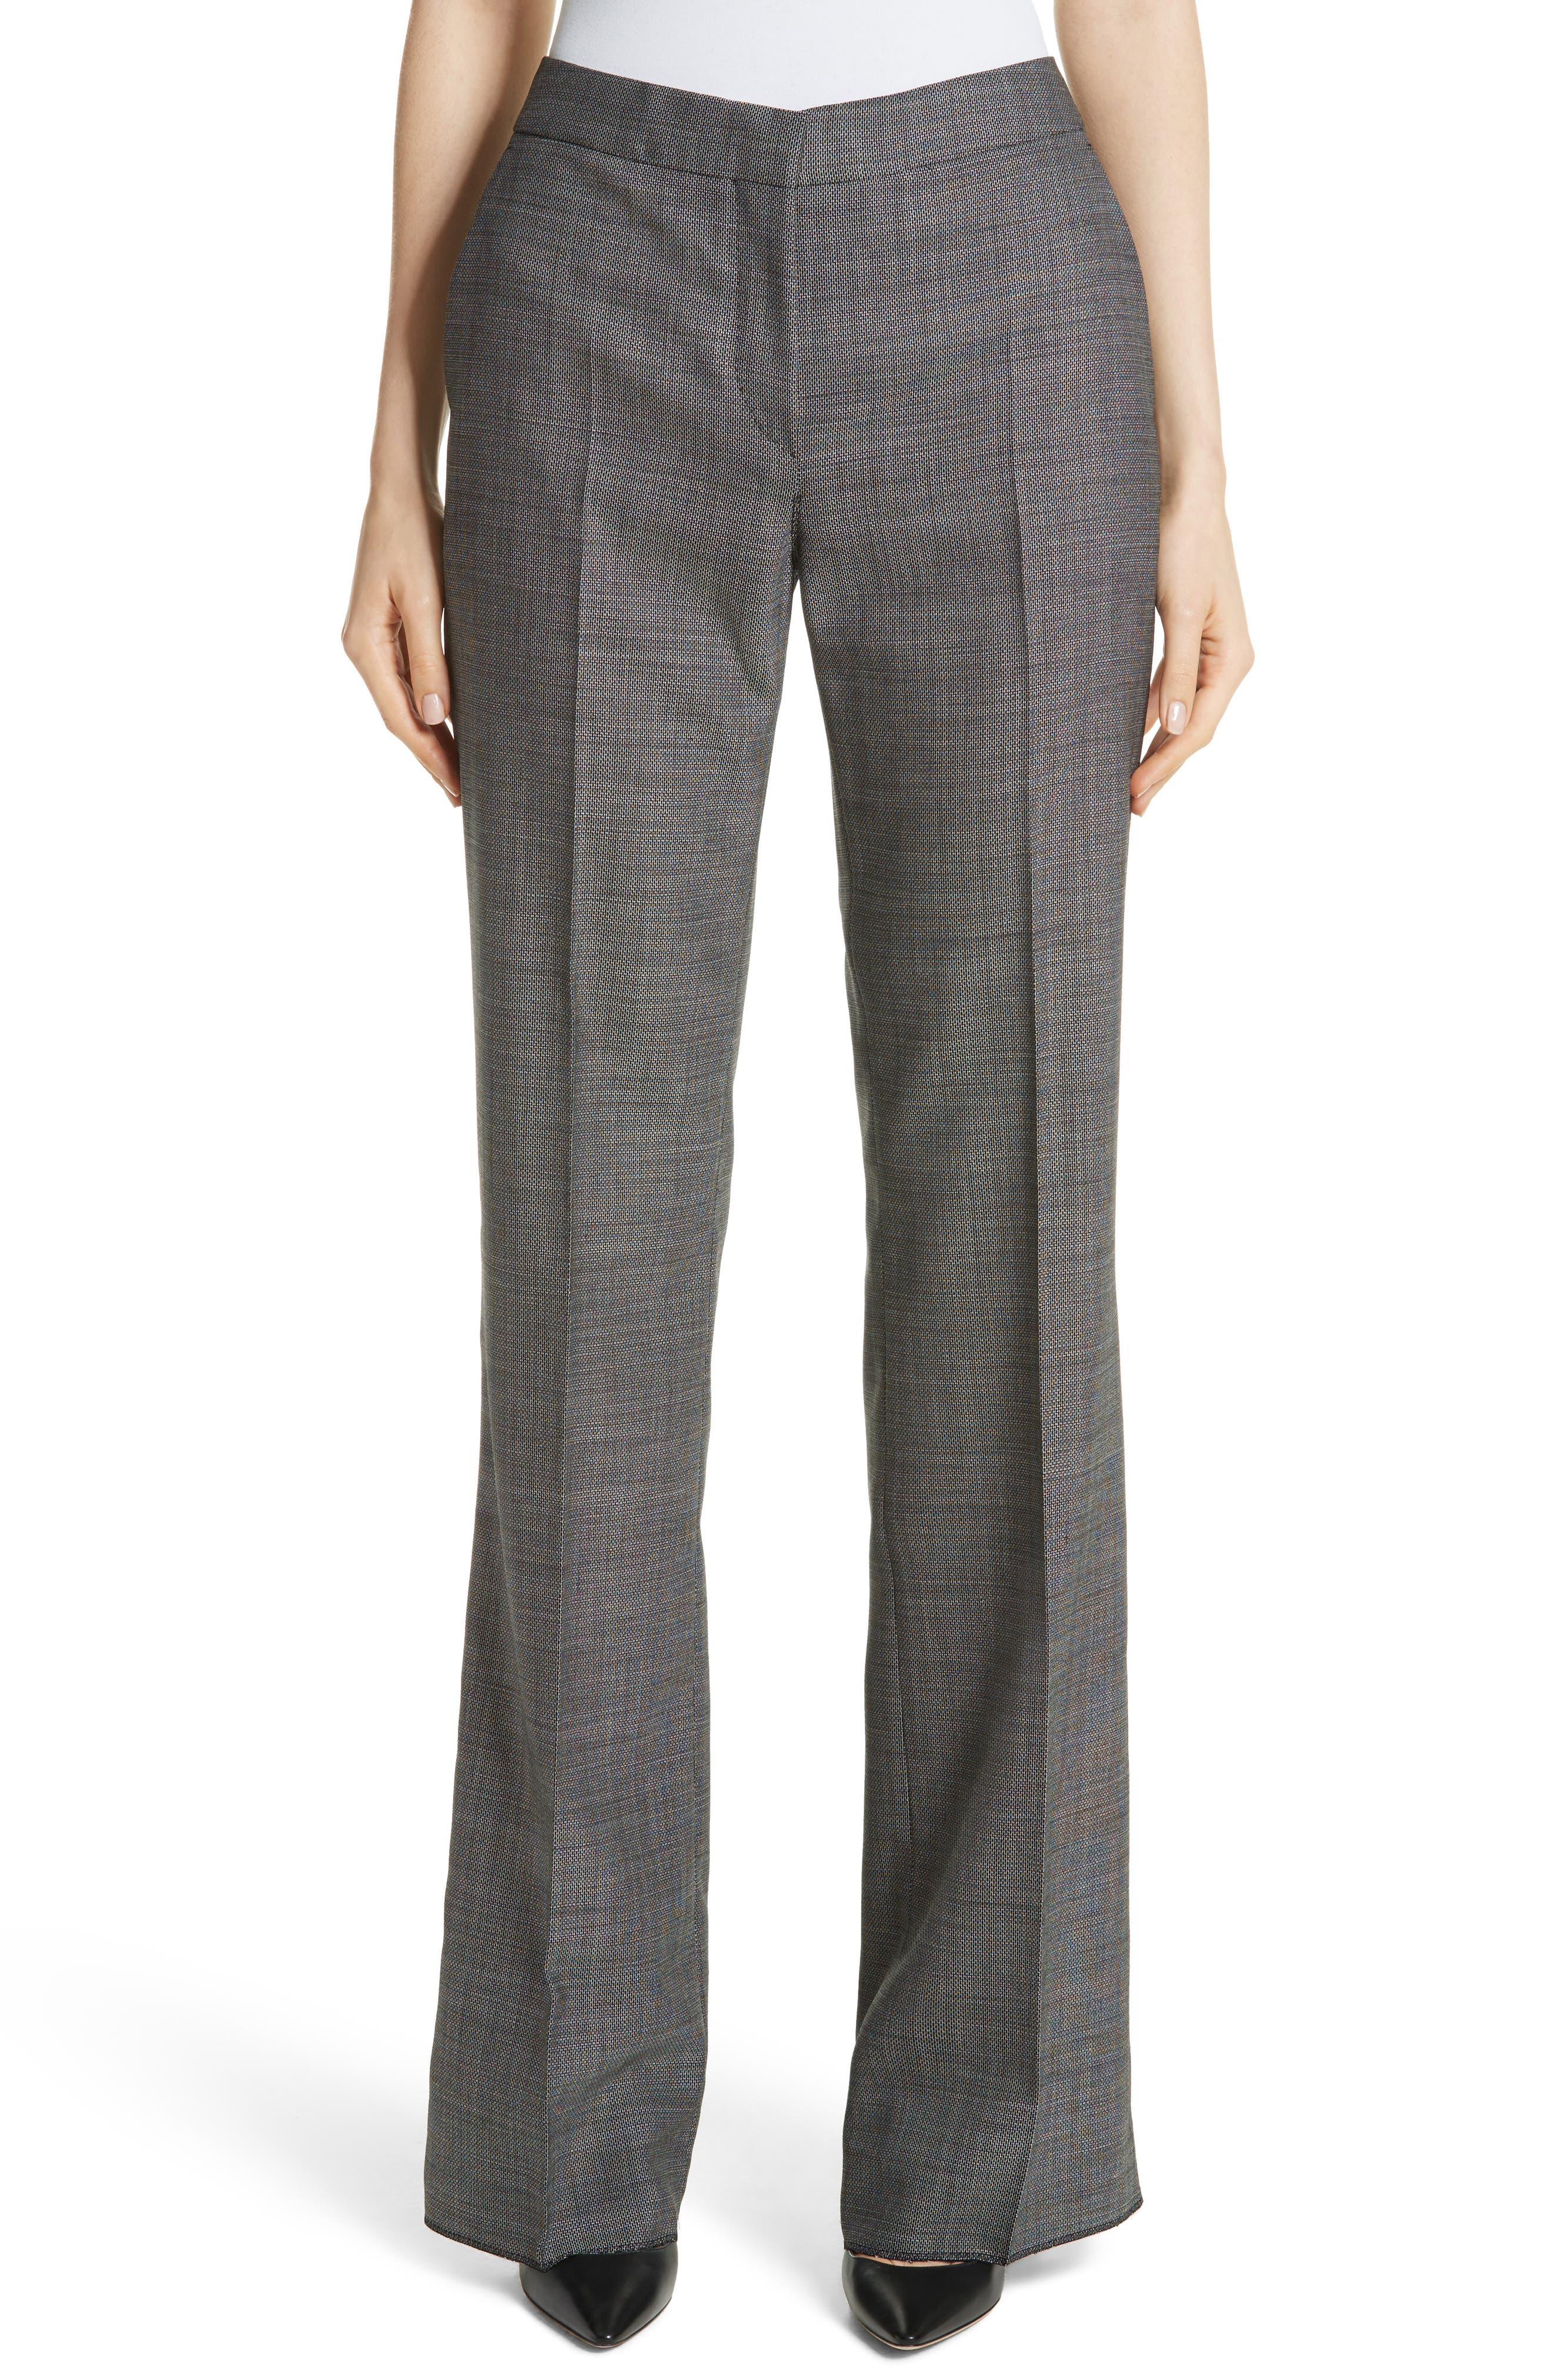 Alternate Image 1 Selected - Max Mara Verbas Stretch Wool Pants